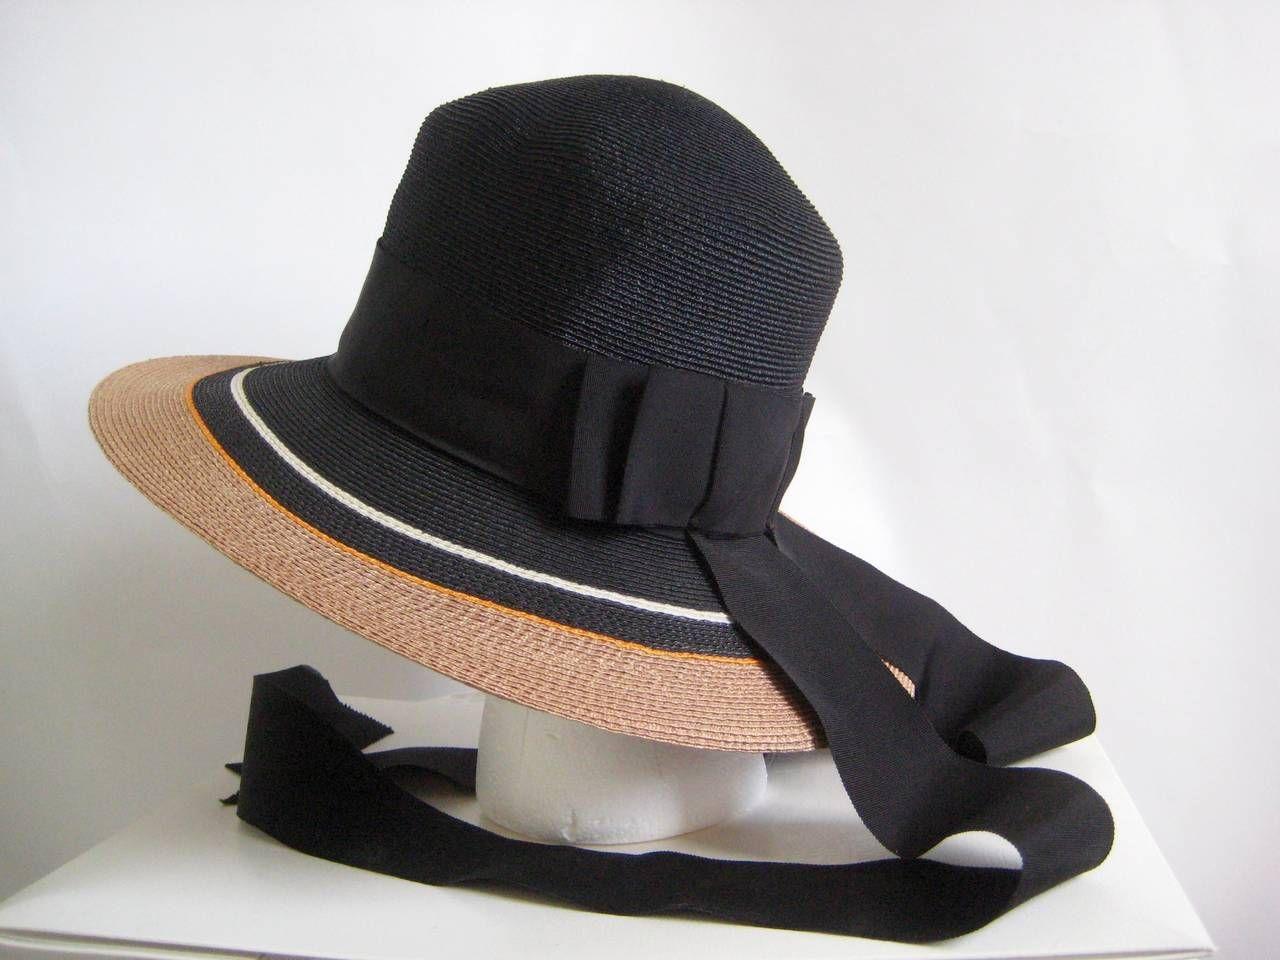 1960s Yves Saint Laurent Straw Hat With Ribbon Streamers 1stdibs Com Hat Designs Hats Yves Saint Laurent